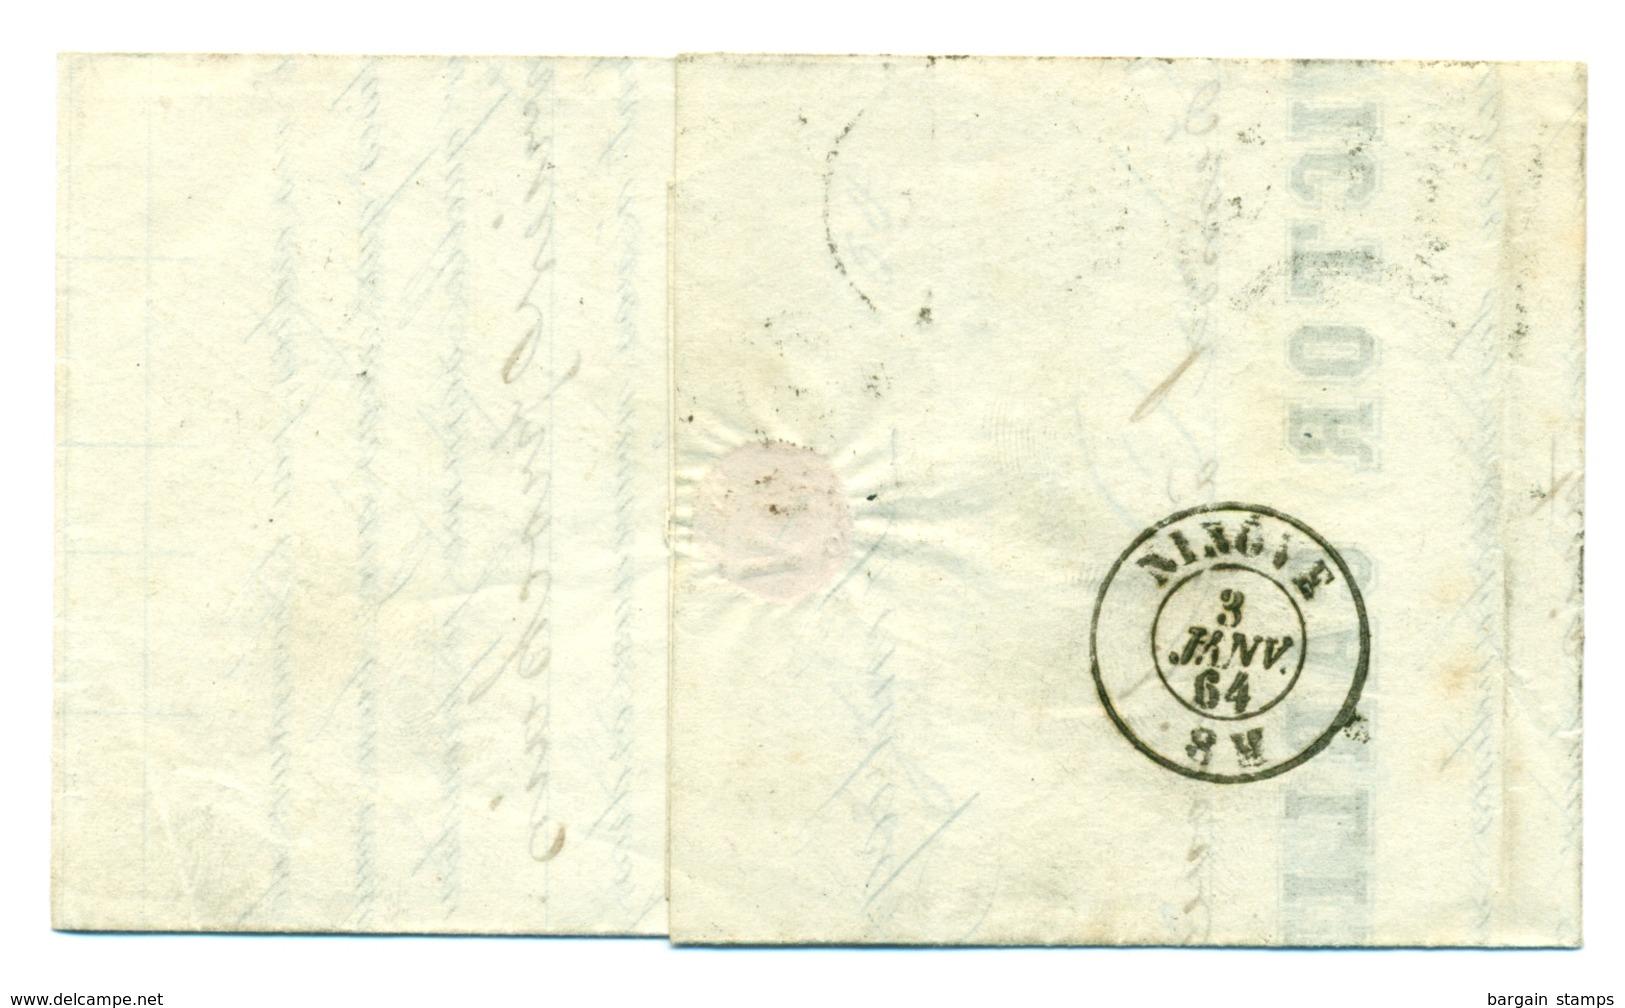 Belgique - COB 14 Ambulant Midi V Sur Pli De Lembecq à Ninove - 2 Jan 1864 - 1863-1864 Médaillons (13/16)